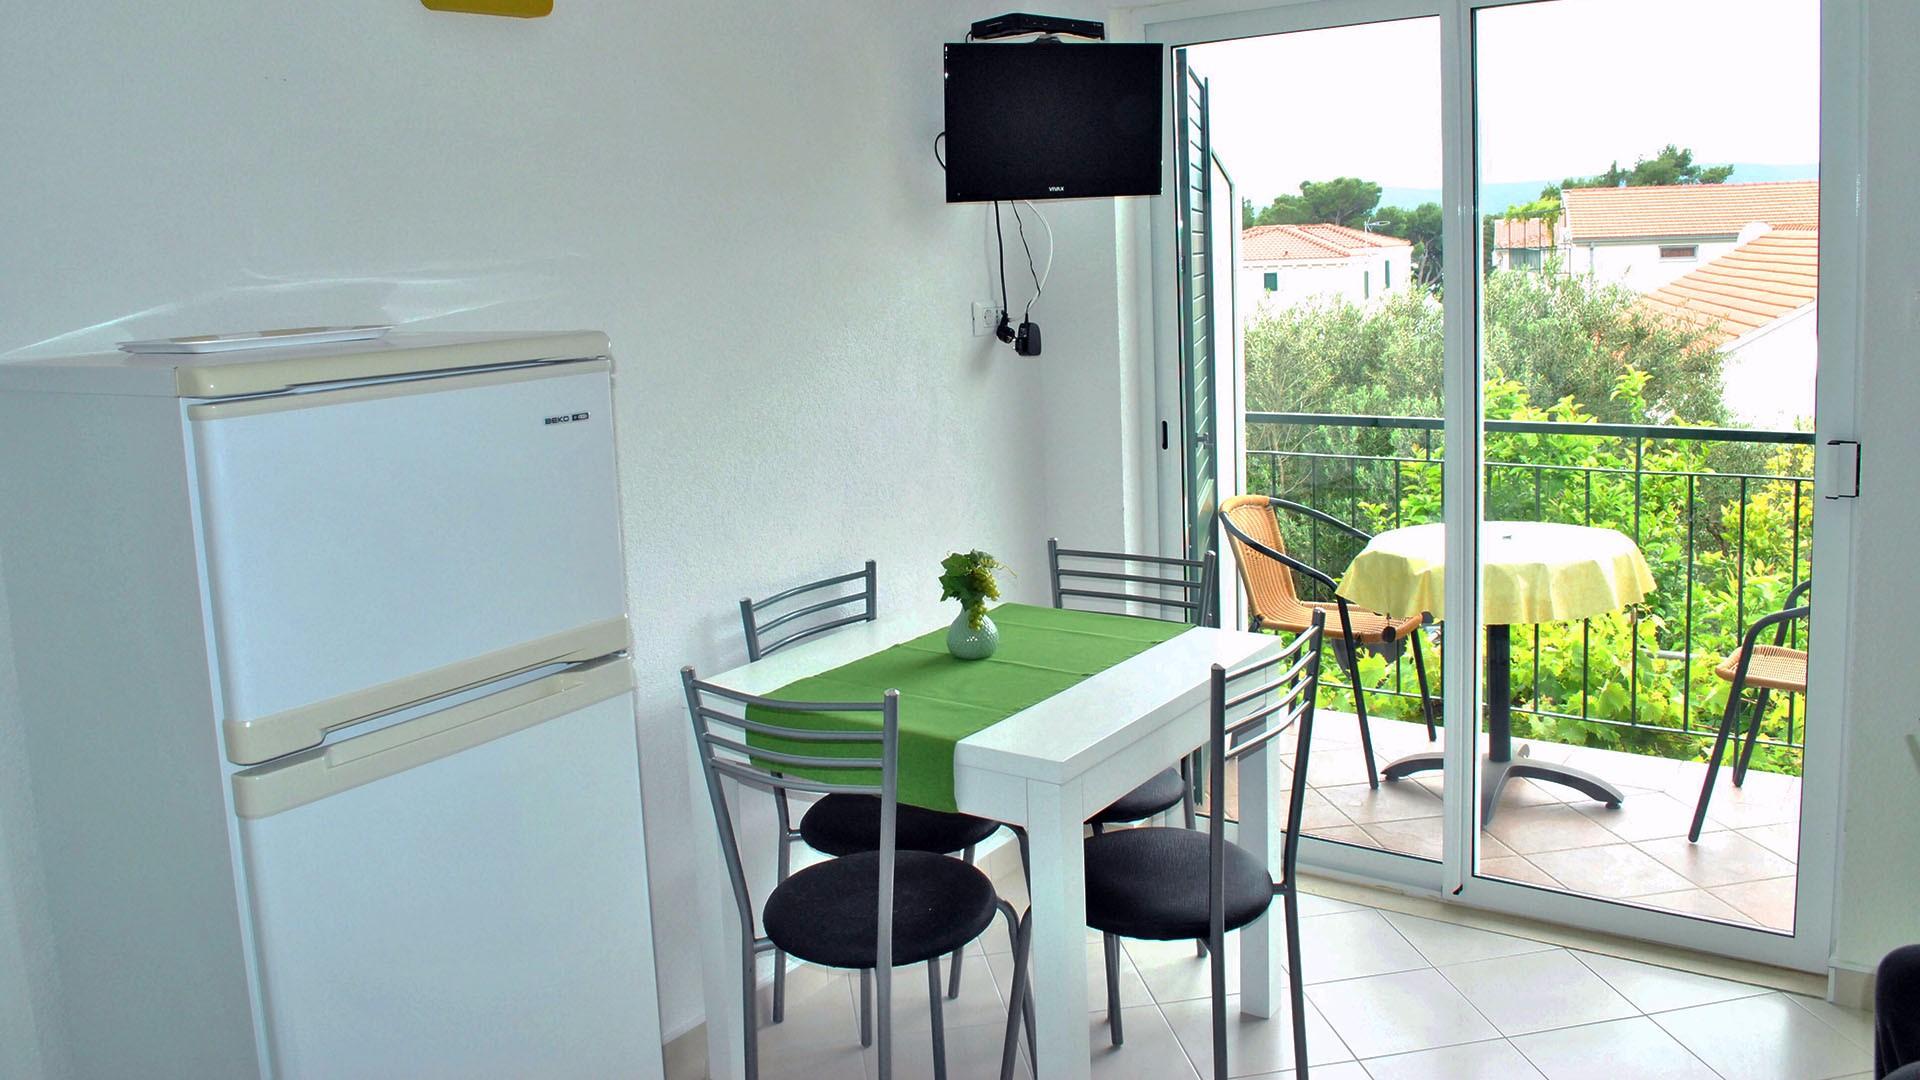 ApartmentA5 kitchen table and balcony